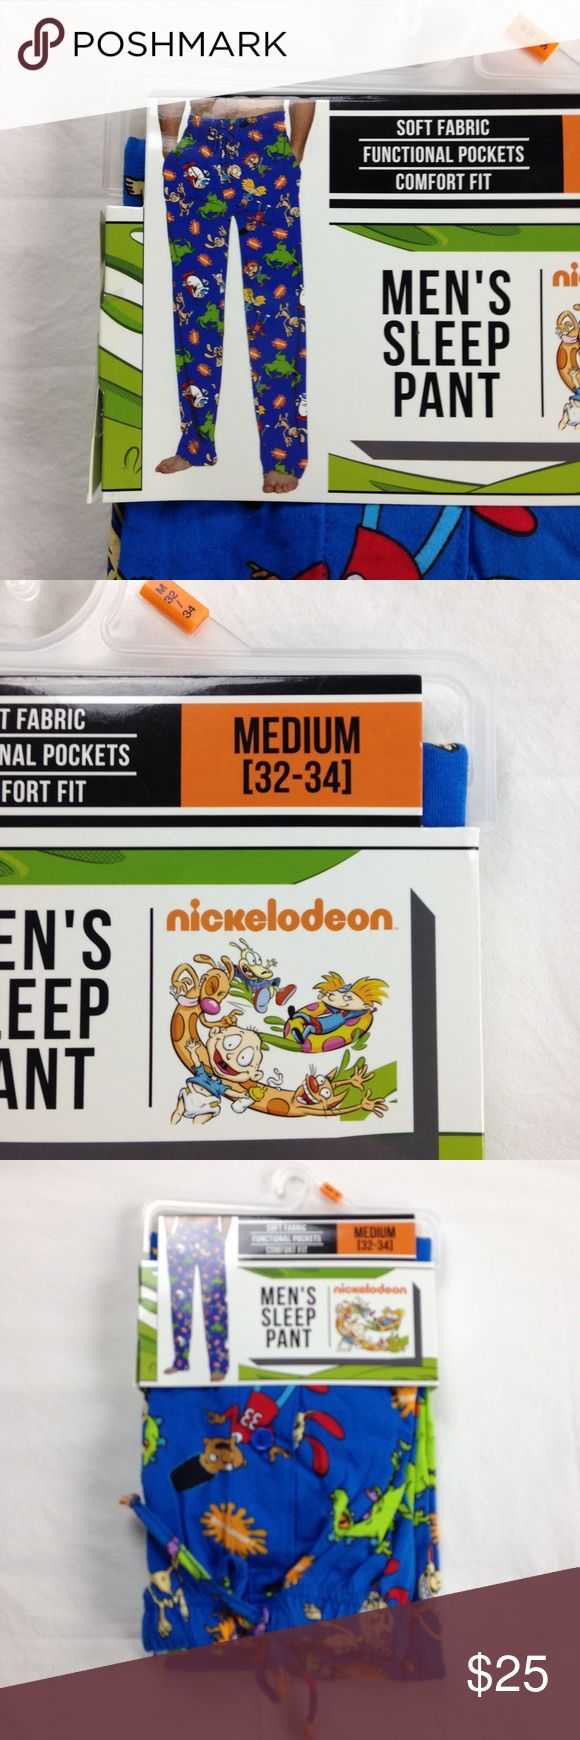 Rugrats Nickelodeon Cartoon Men's Pajama Pj Medium Nickelodeon Cartoon Men's Rugrats Blue Sleep Pajama Pjs Lounge Pants Medium 32 - 34 inches Has pockets and drawstring    100% Cotton     binF11 Nickelodeon Pants Sweatpants & Joggers